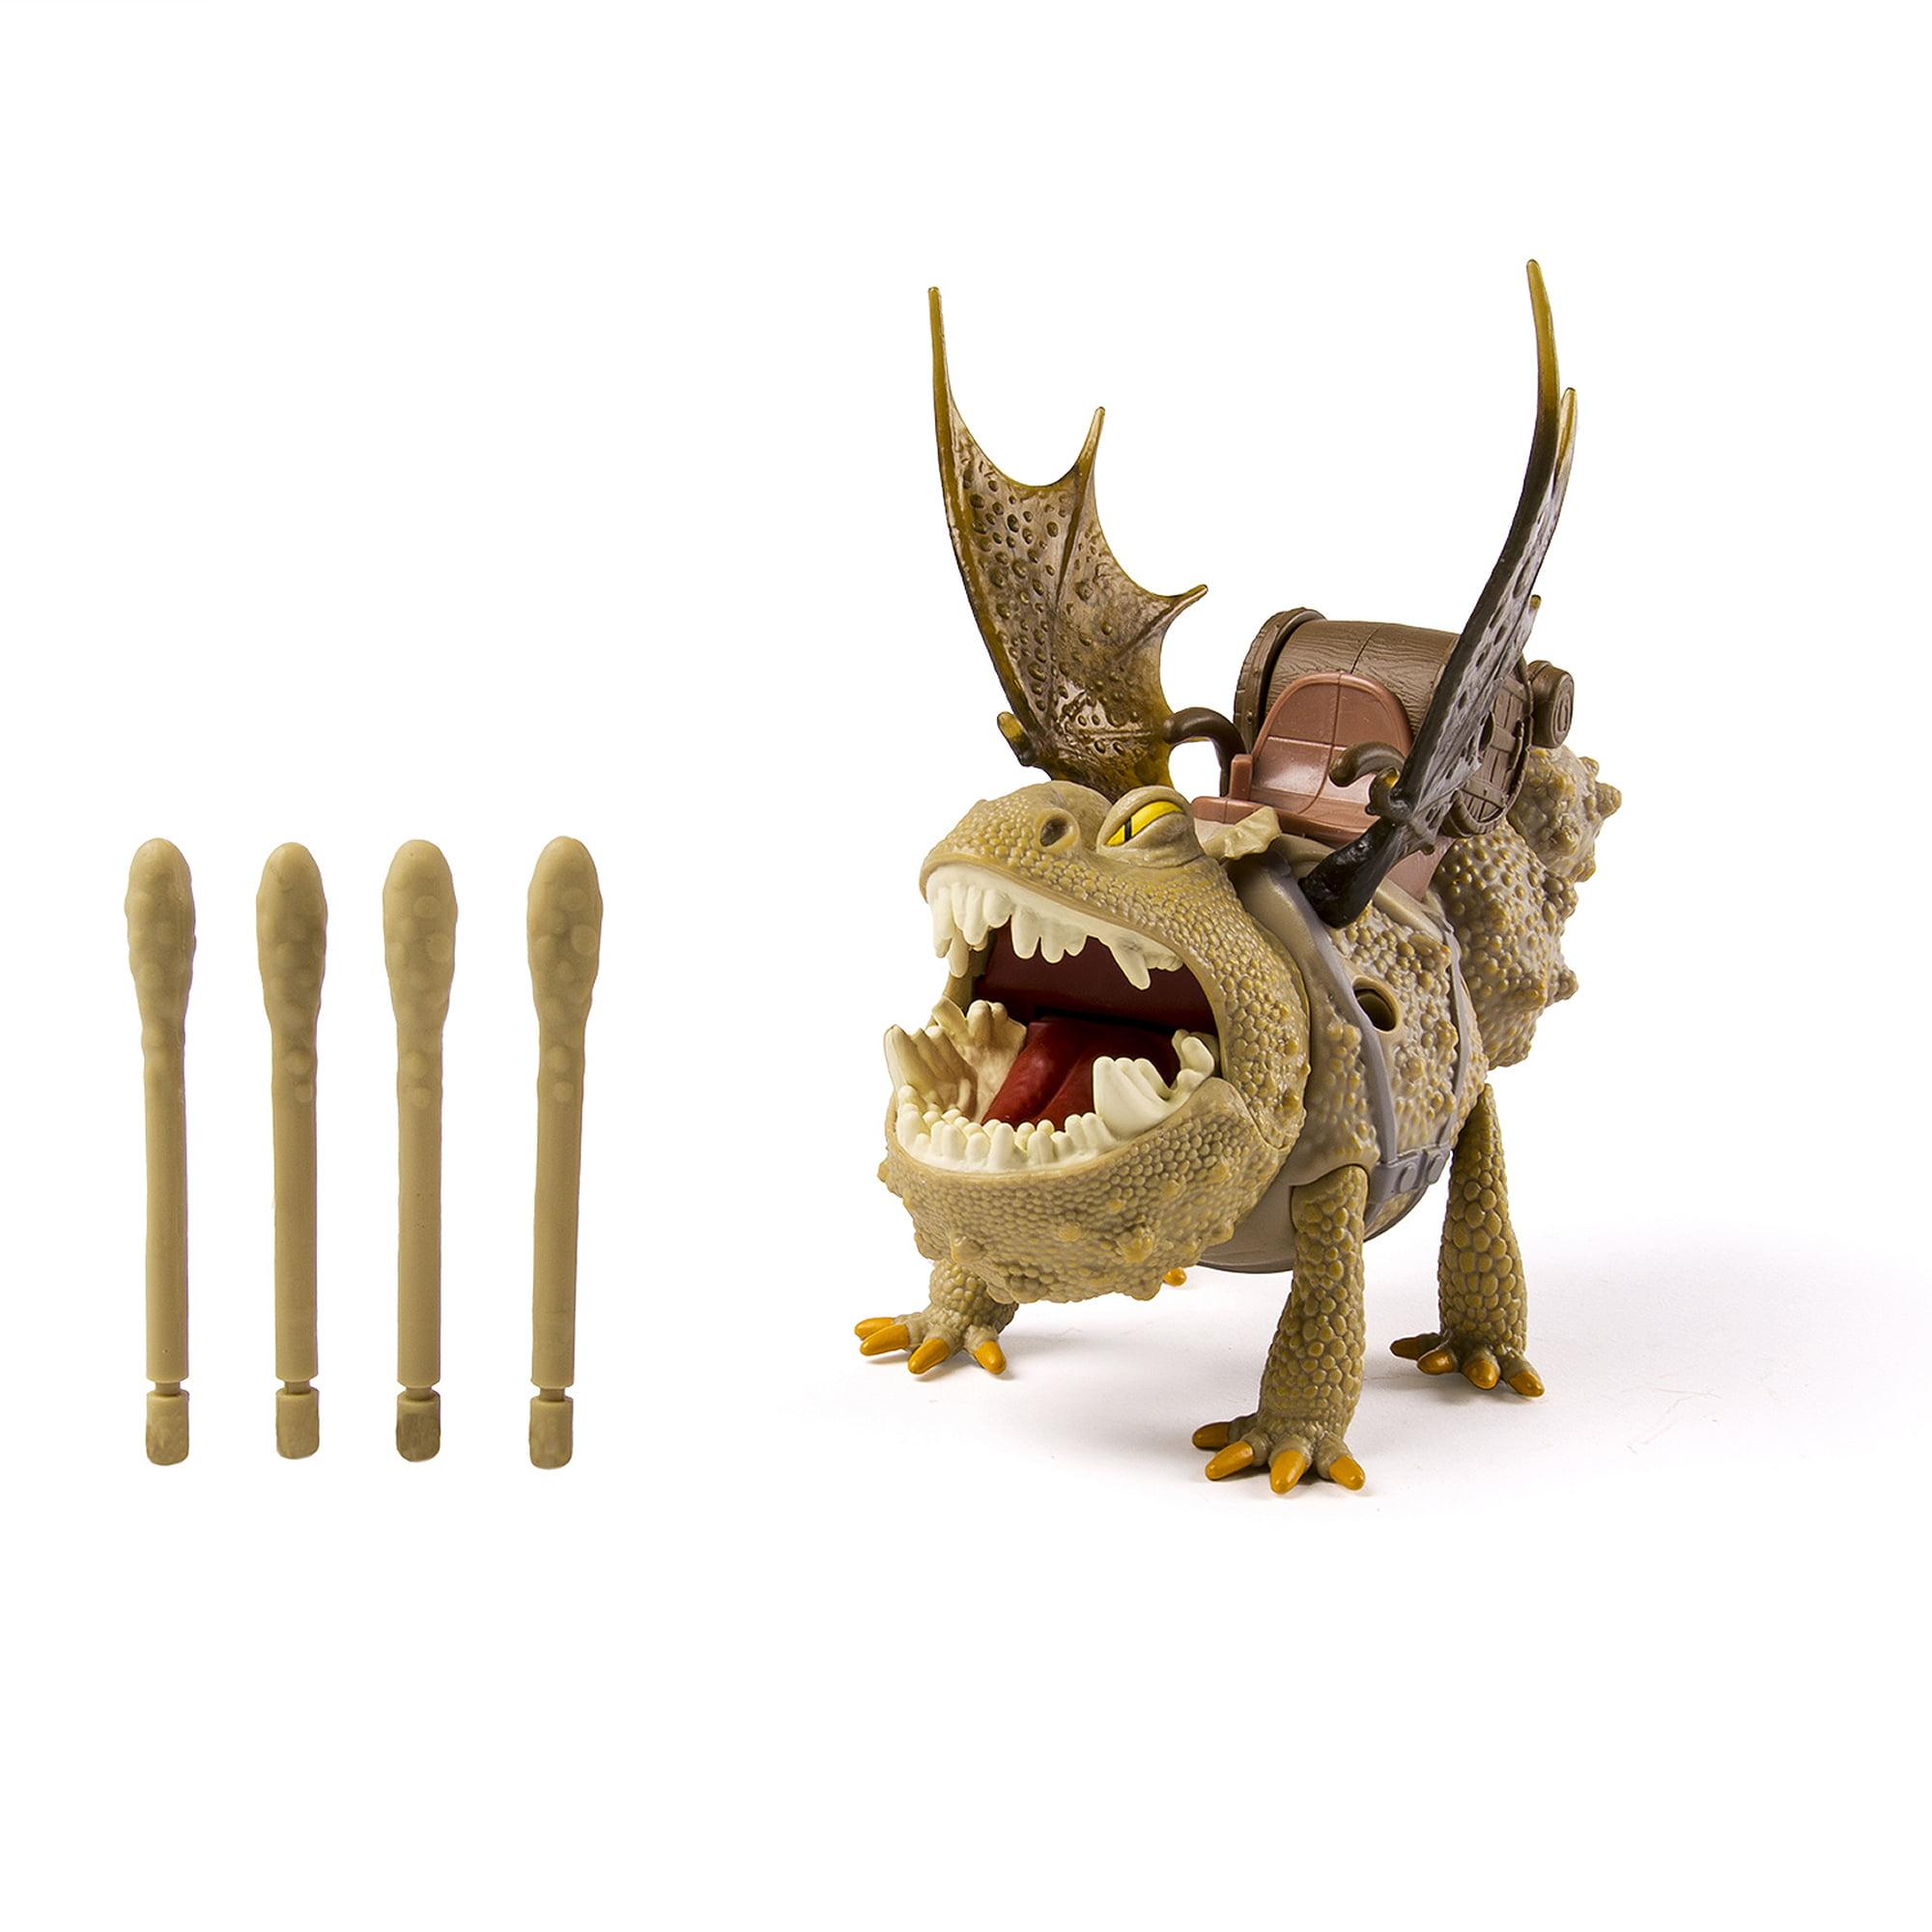 Dreamworks Dragons: How To Train Your Dragon 2 Meatlug Power Dragon   Walmart